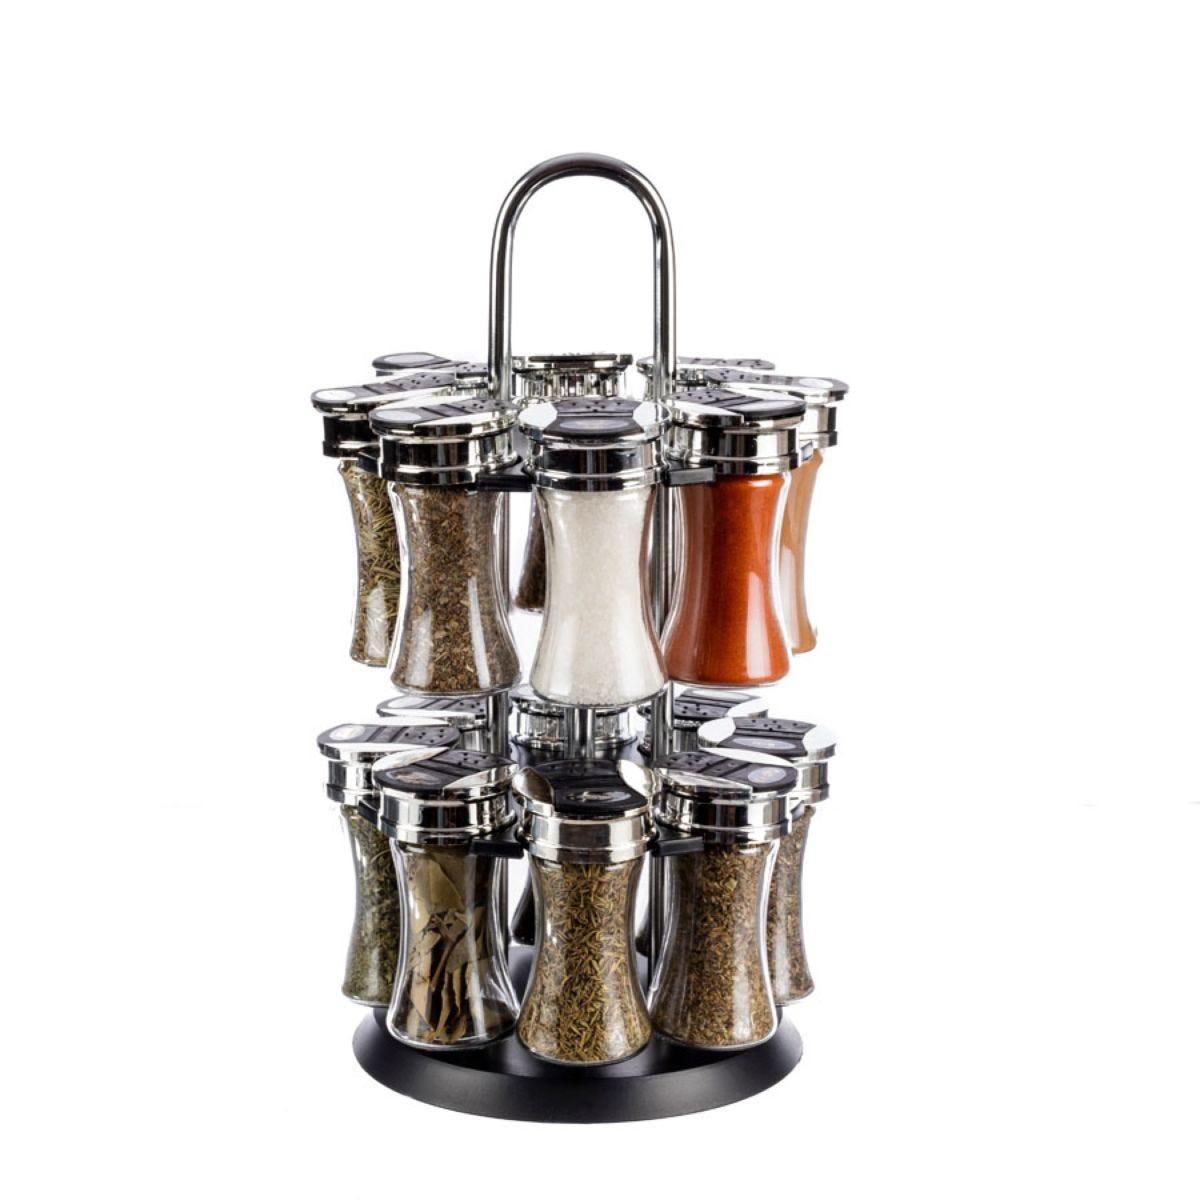 16 Jar Spice Rack - Silver